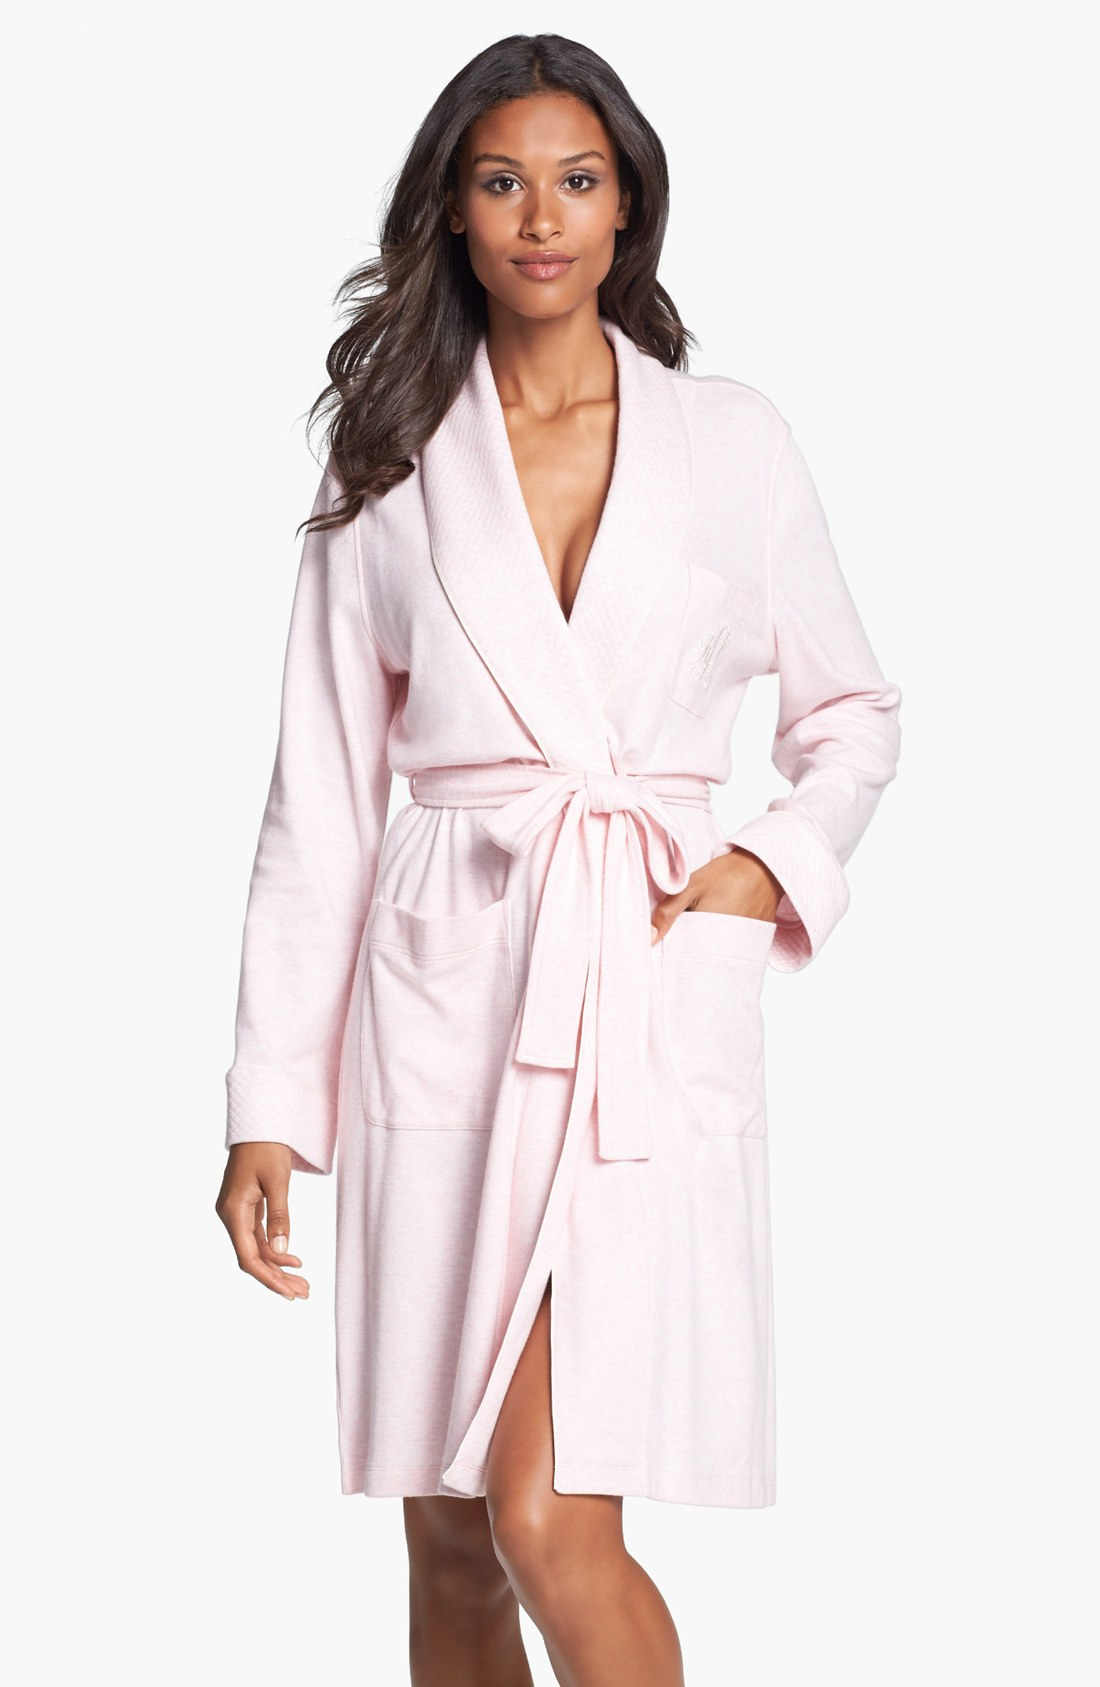 lauren by ralph lauren waffle weave robe in pink ballet pink heather lyst. Black Bedroom Furniture Sets. Home Design Ideas